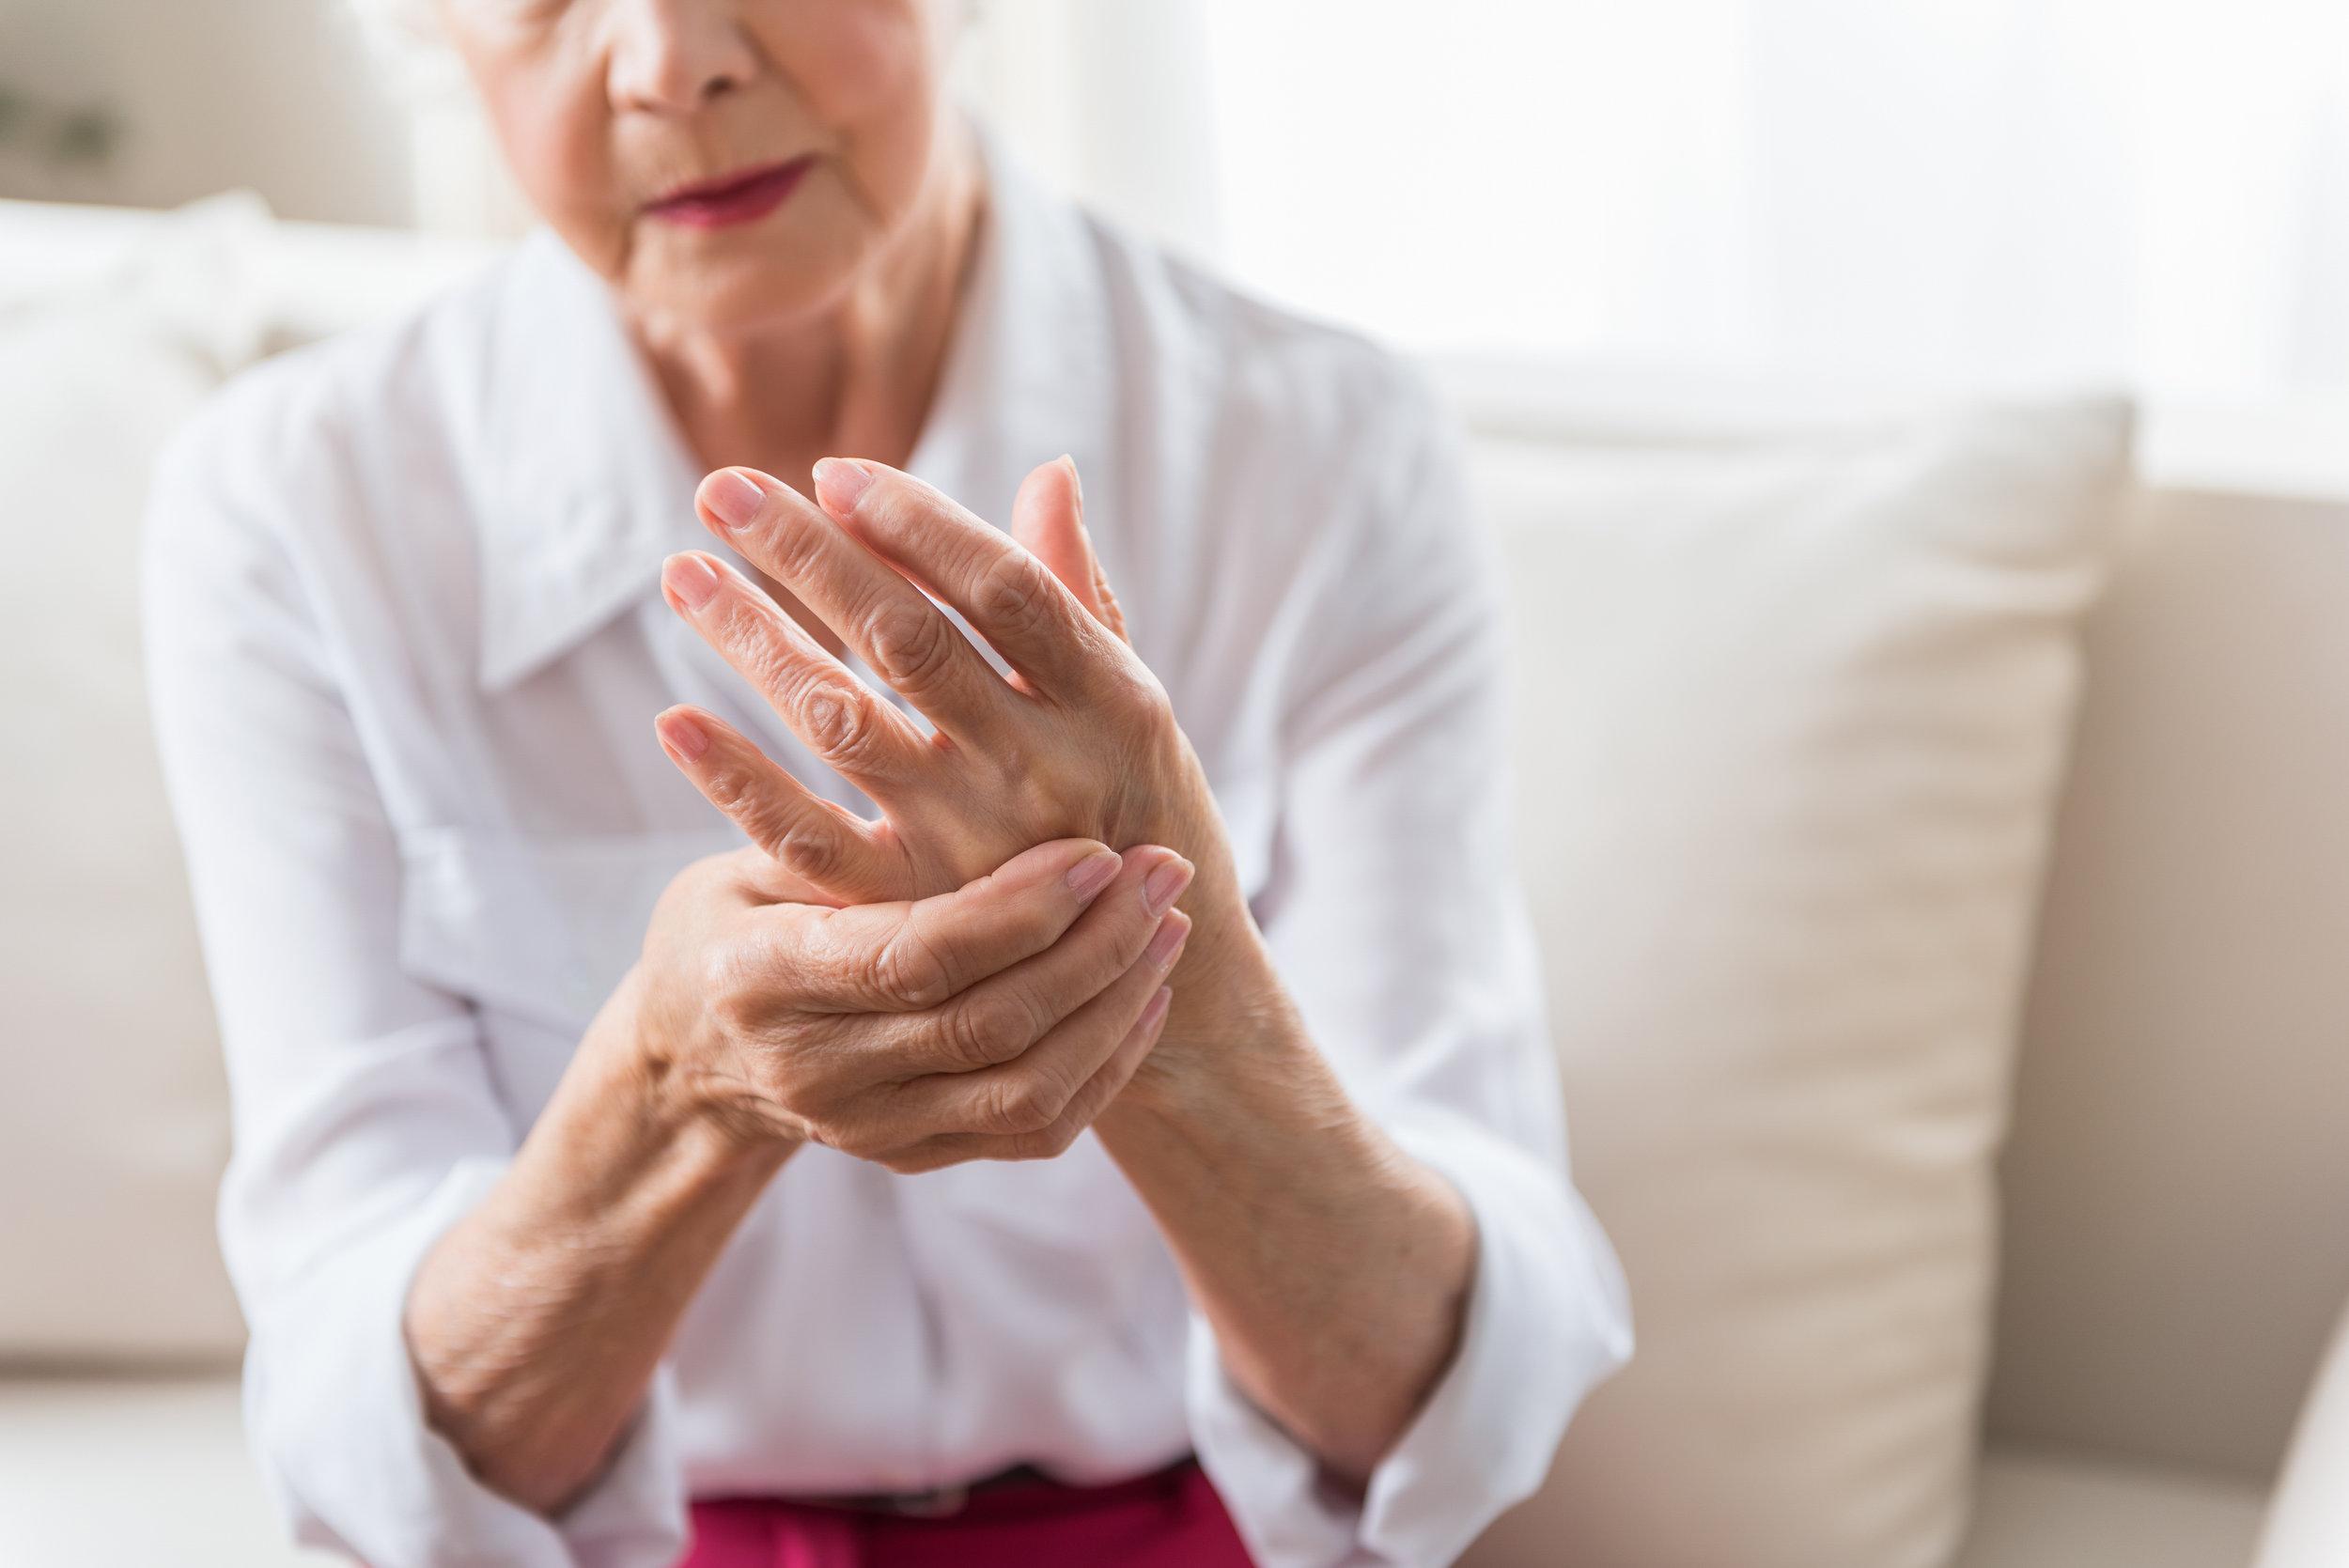 Reduce Pain - fibromyalgia, arthritis, headaches, migraines, menstrual pain